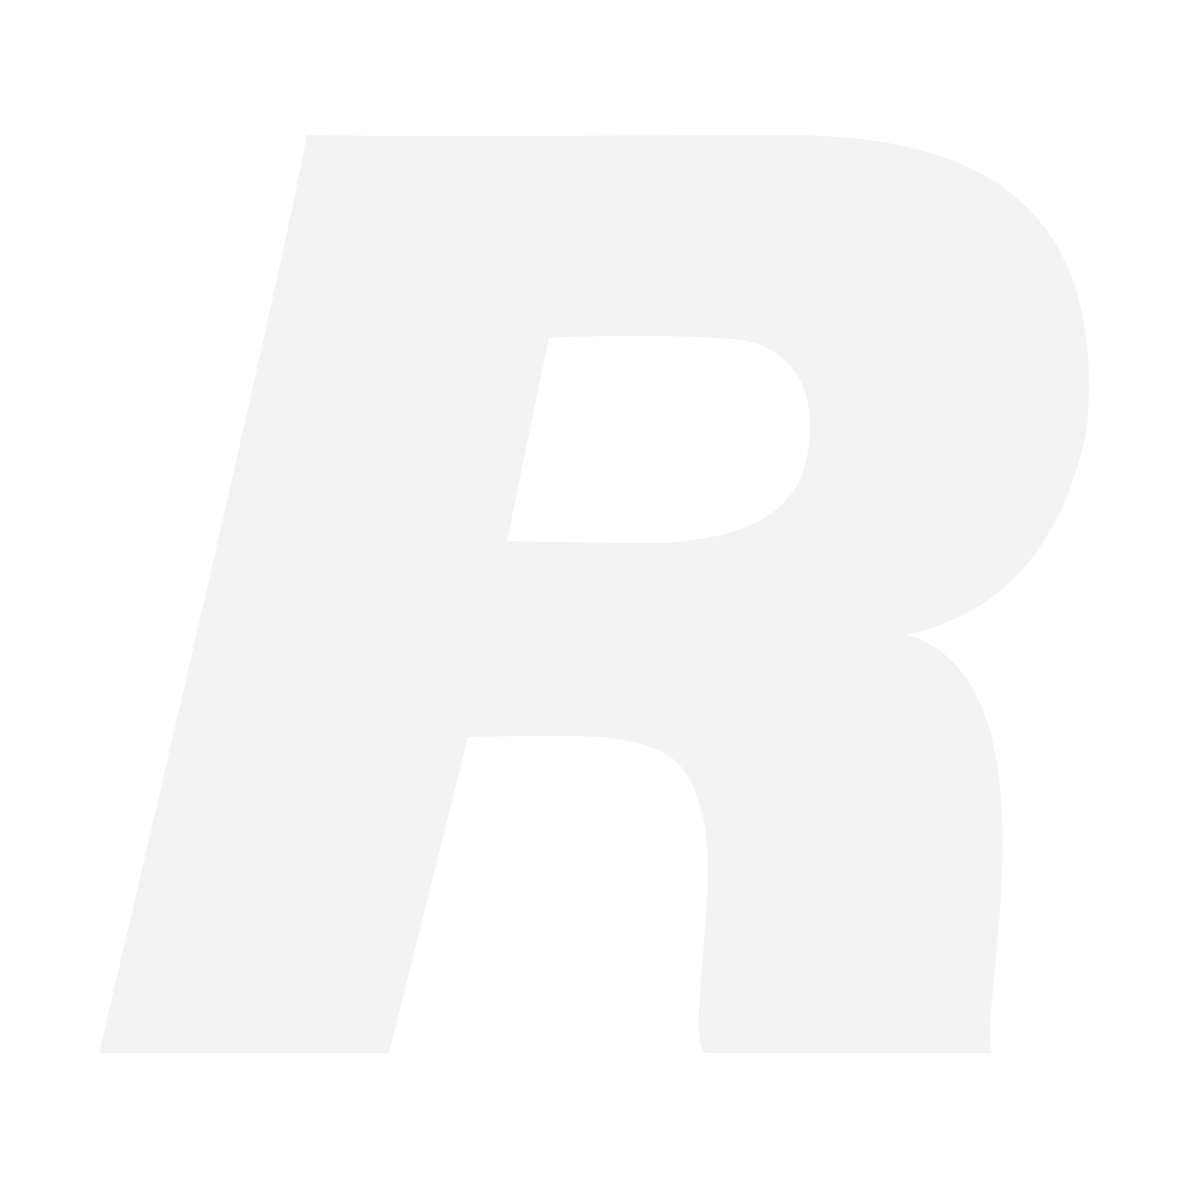 Sony vastavalosuoja (RX10 III, RX10 IV)